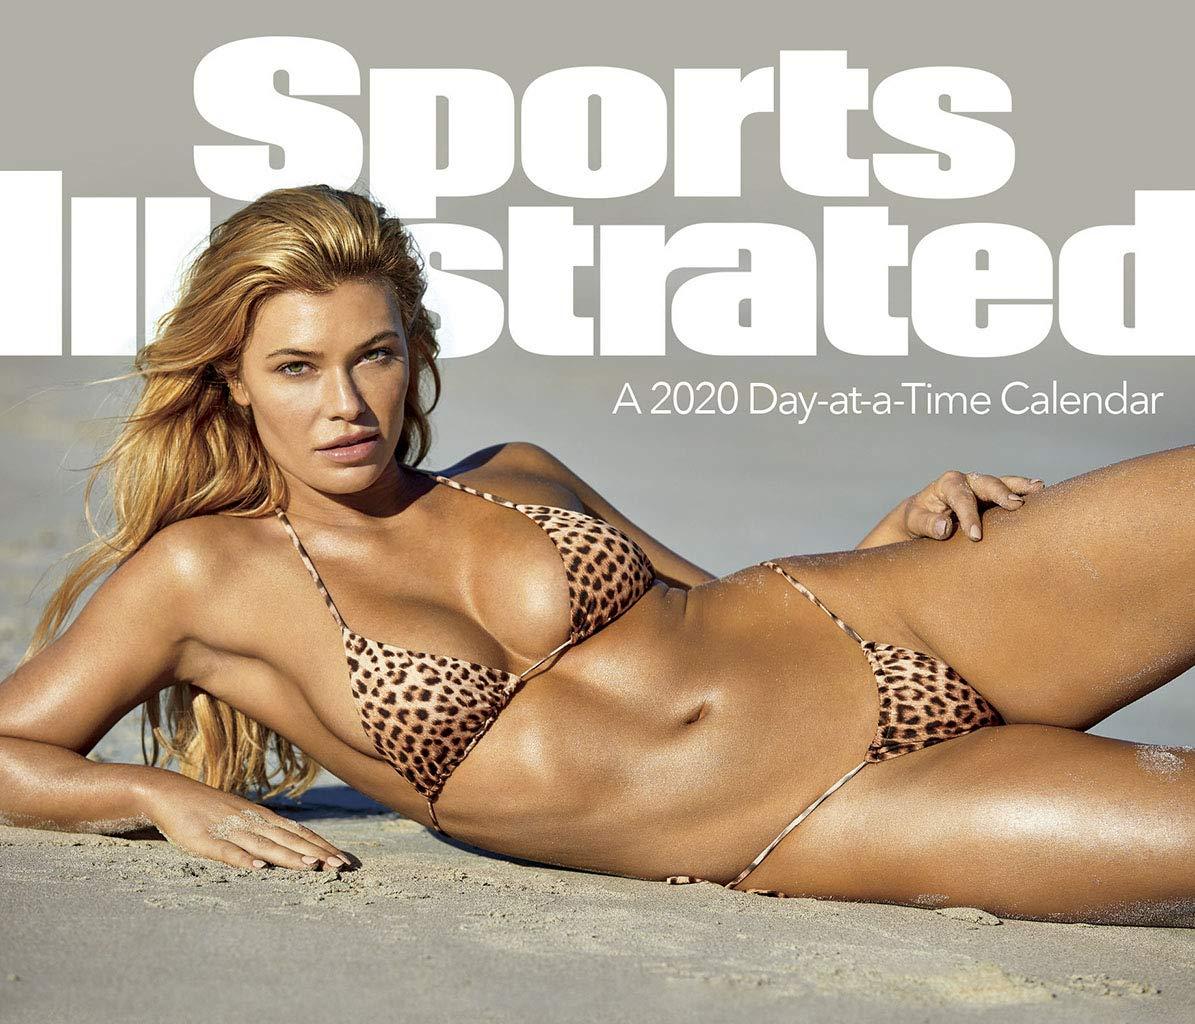 Sports Illustrated Swimsuit 2020 Box Calendar Trends International 9781438868448 Amazon Com Books